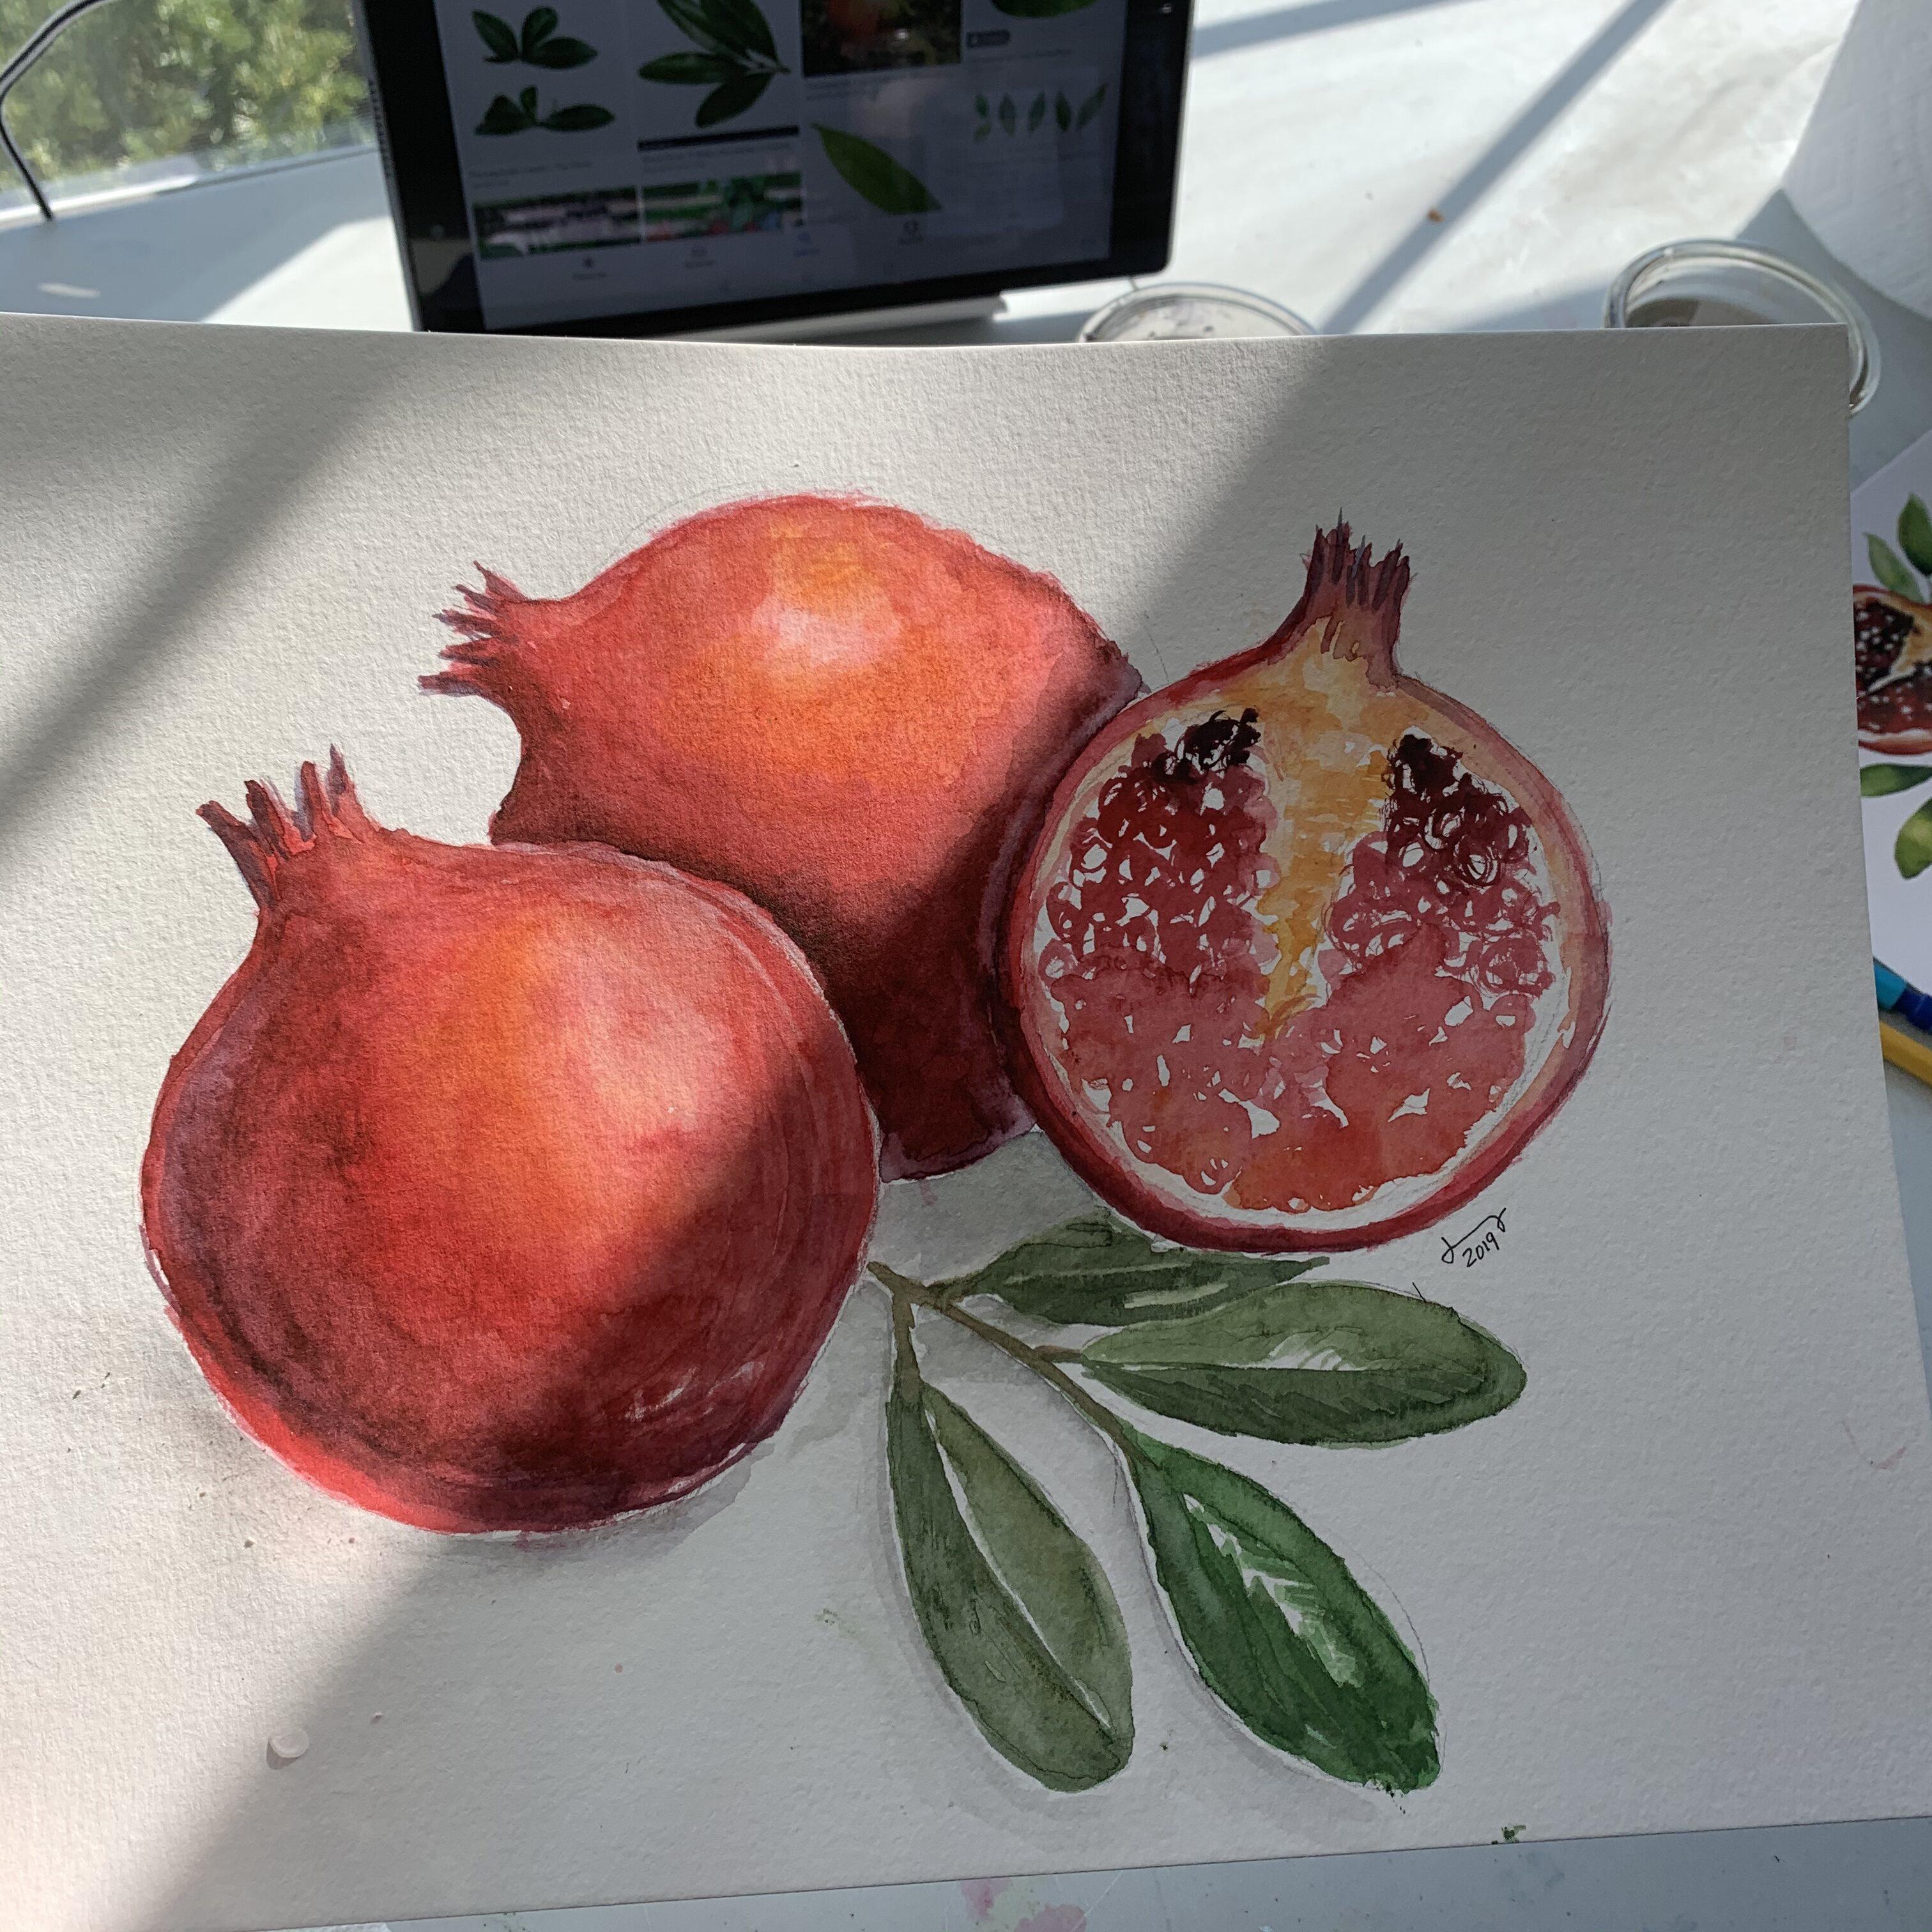 40937475 5588 40DA BAD3 D67DEC149125 Fall Pomegranate and leaf